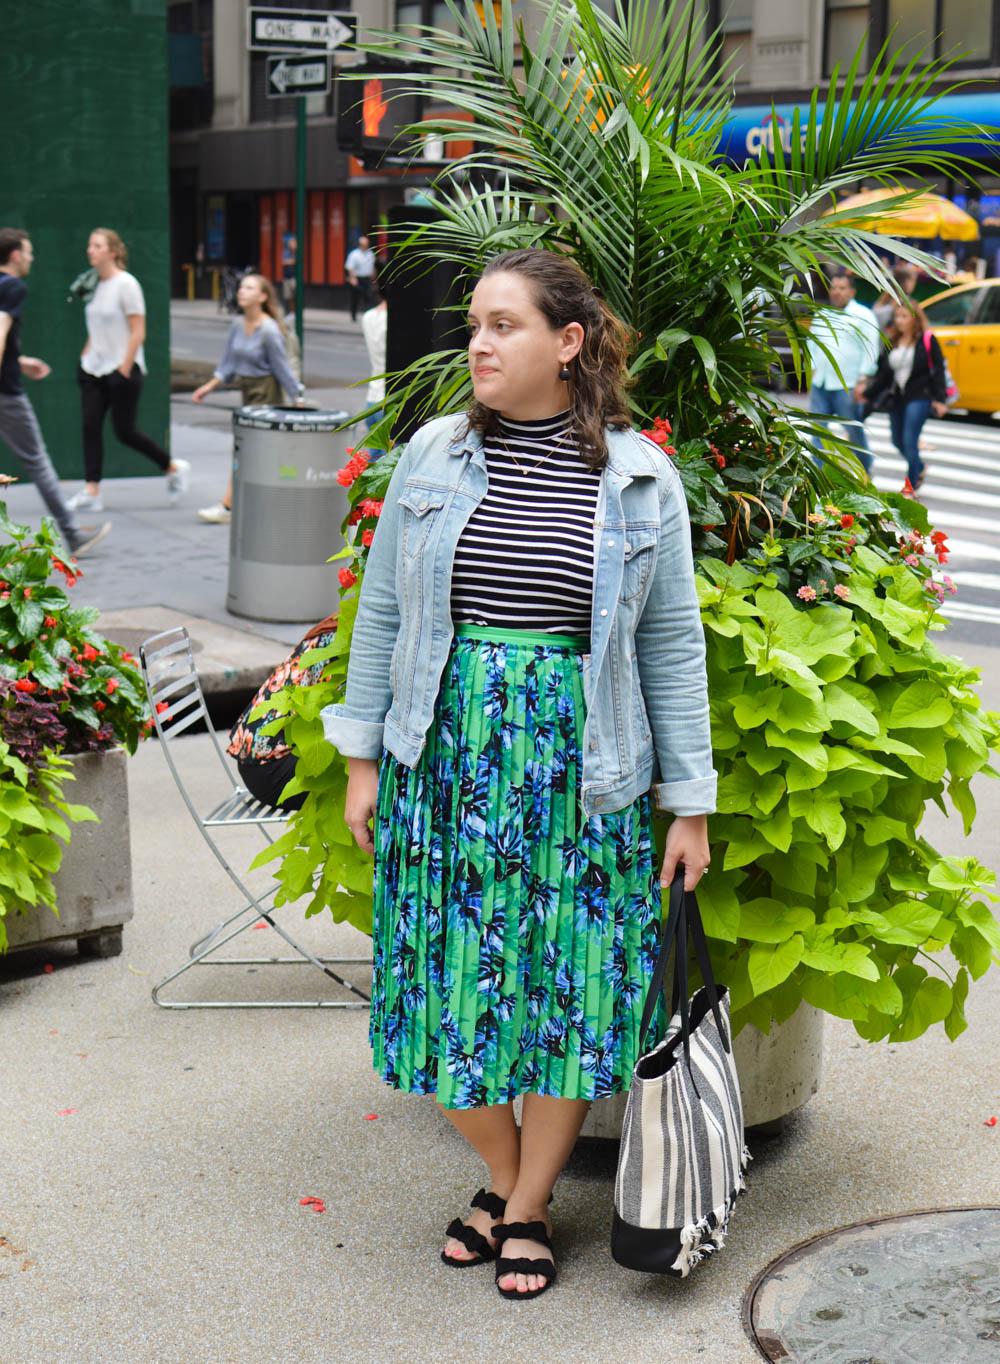 Early fall fashion